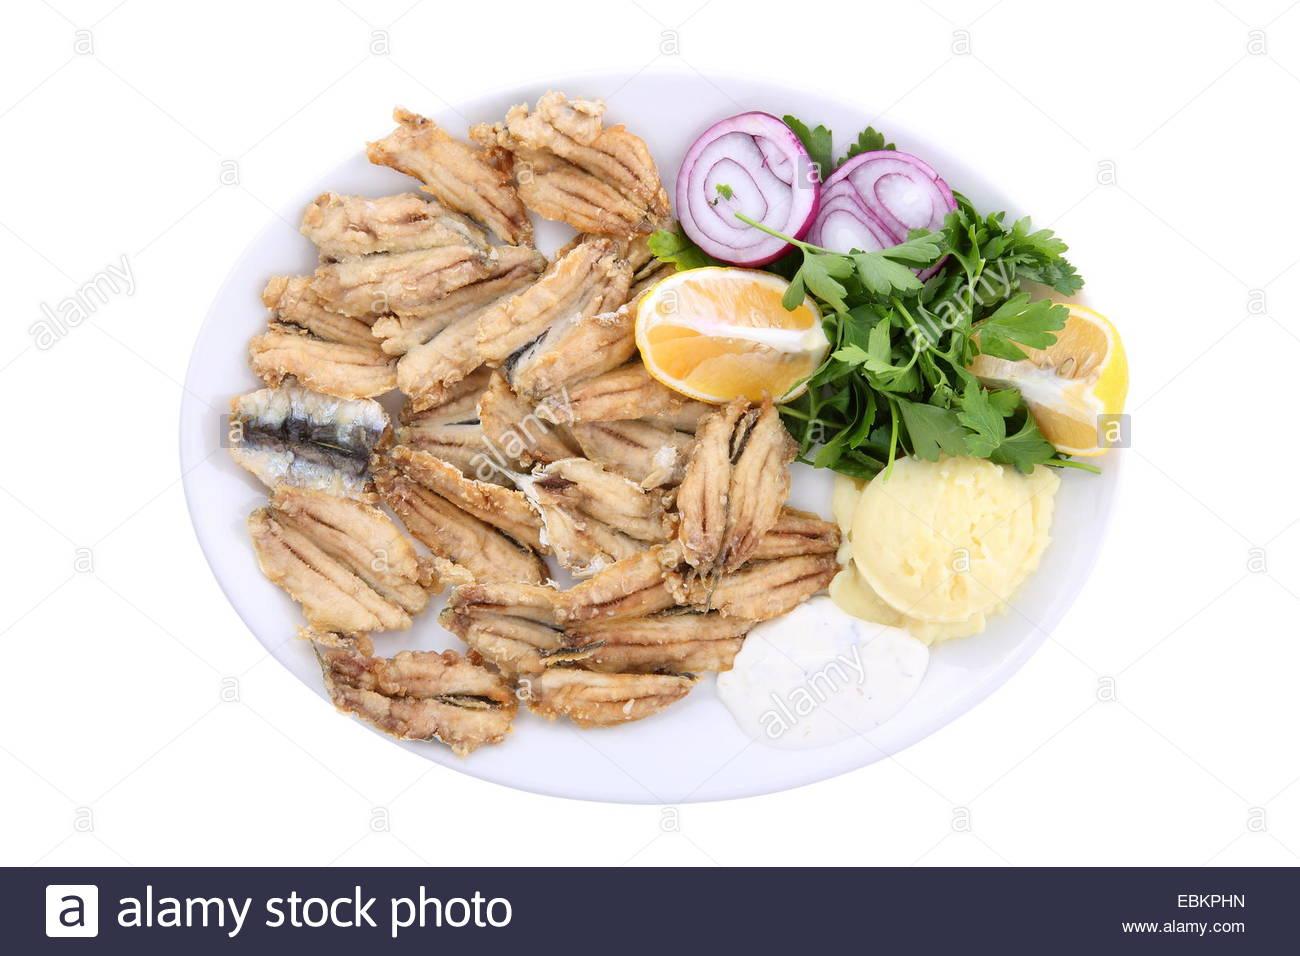 fish/food - Stock Image